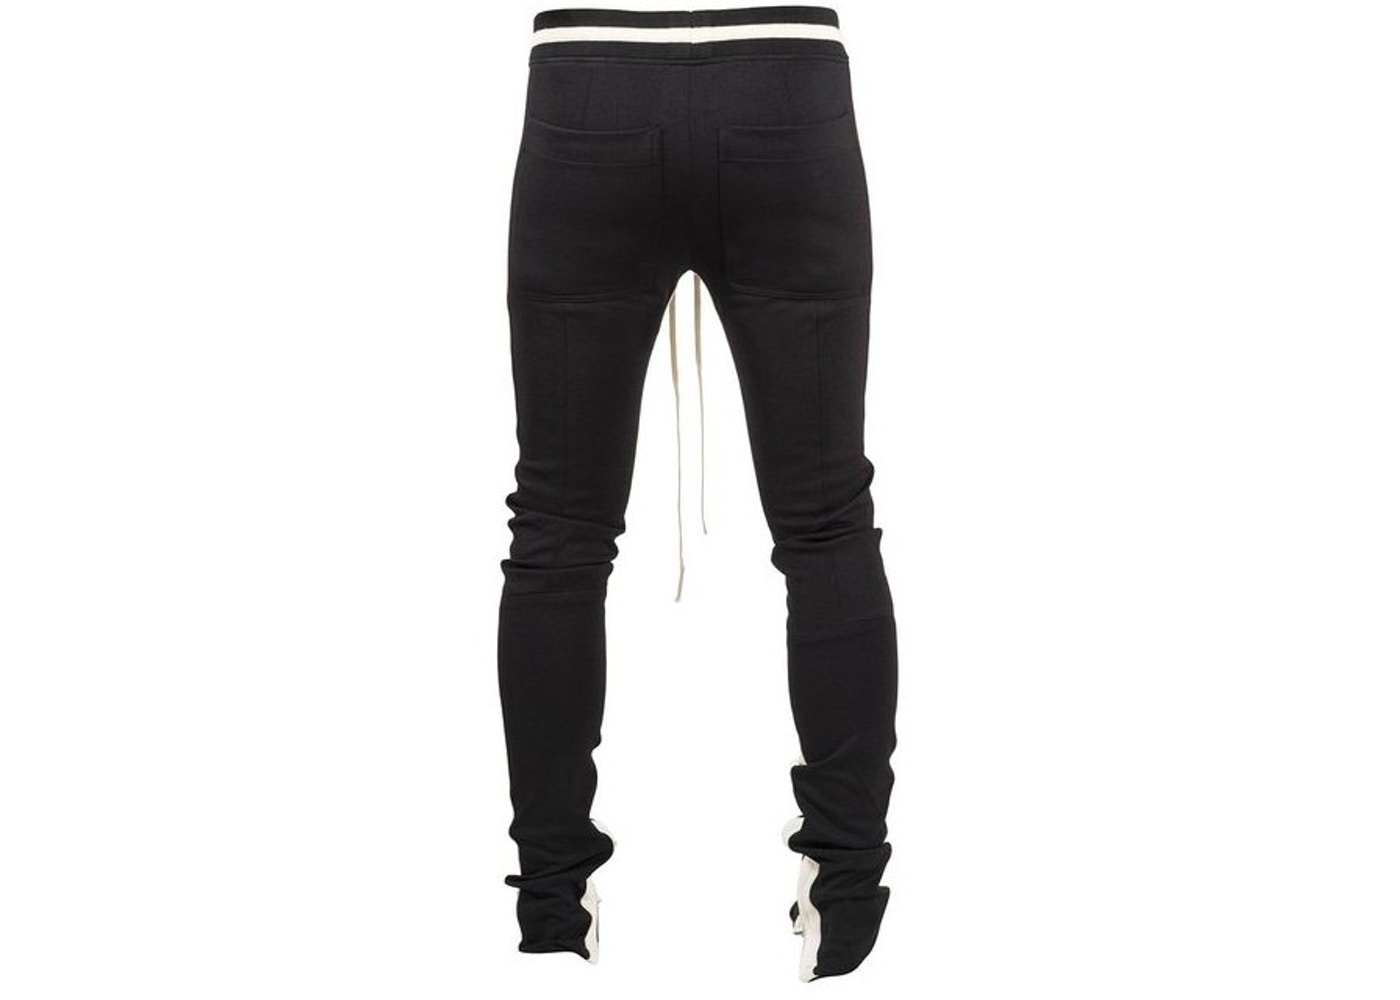 FEAR OF GOD Double Stripe Track Pants Black/White